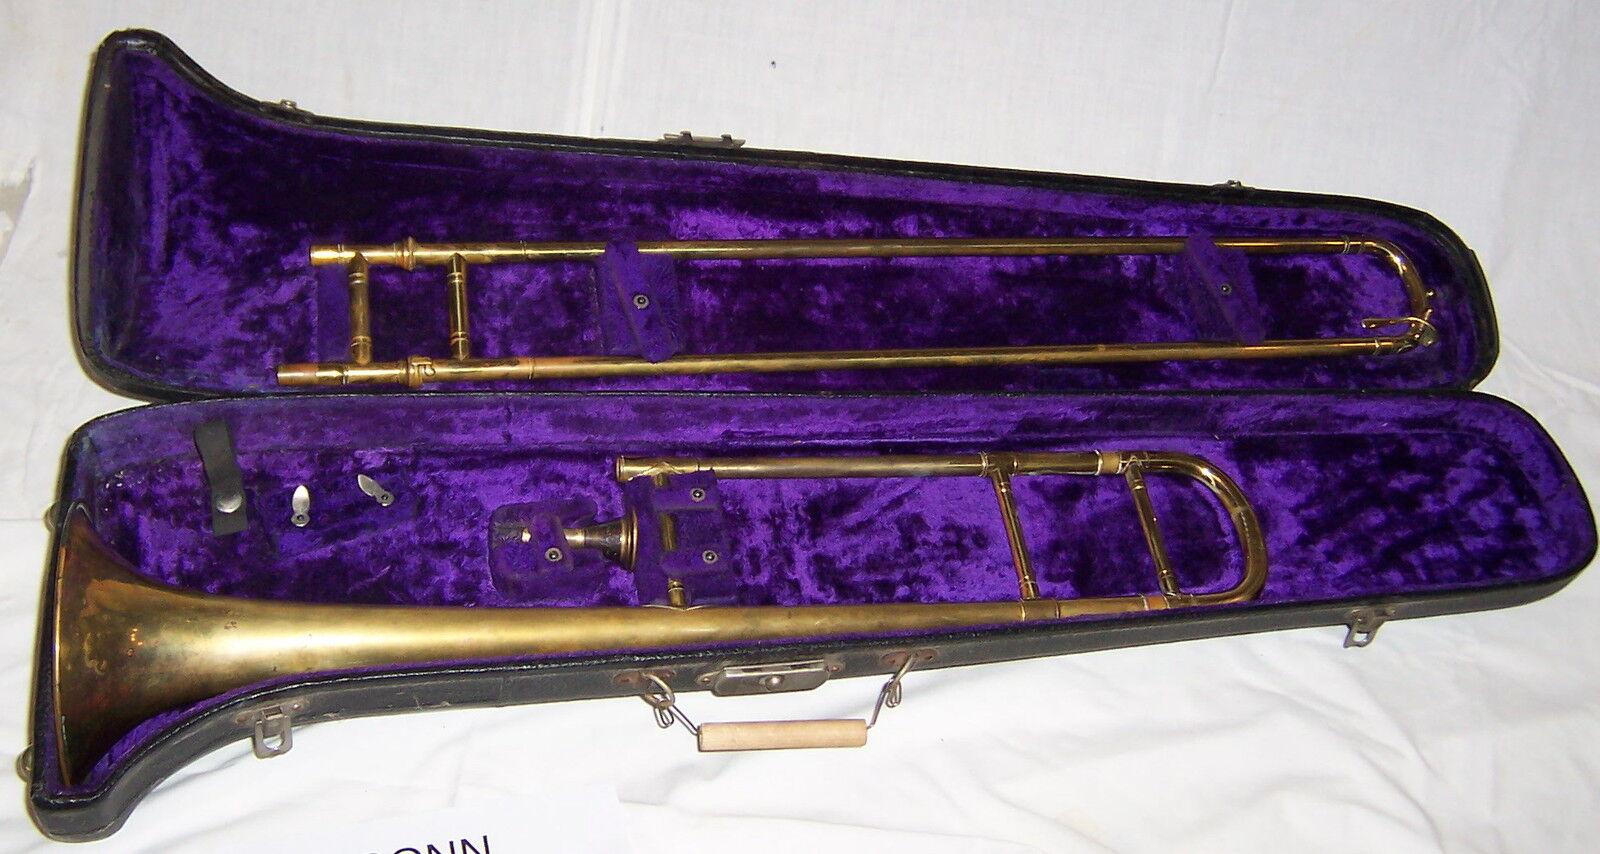 Connecticut, el trombón retro de 1907.